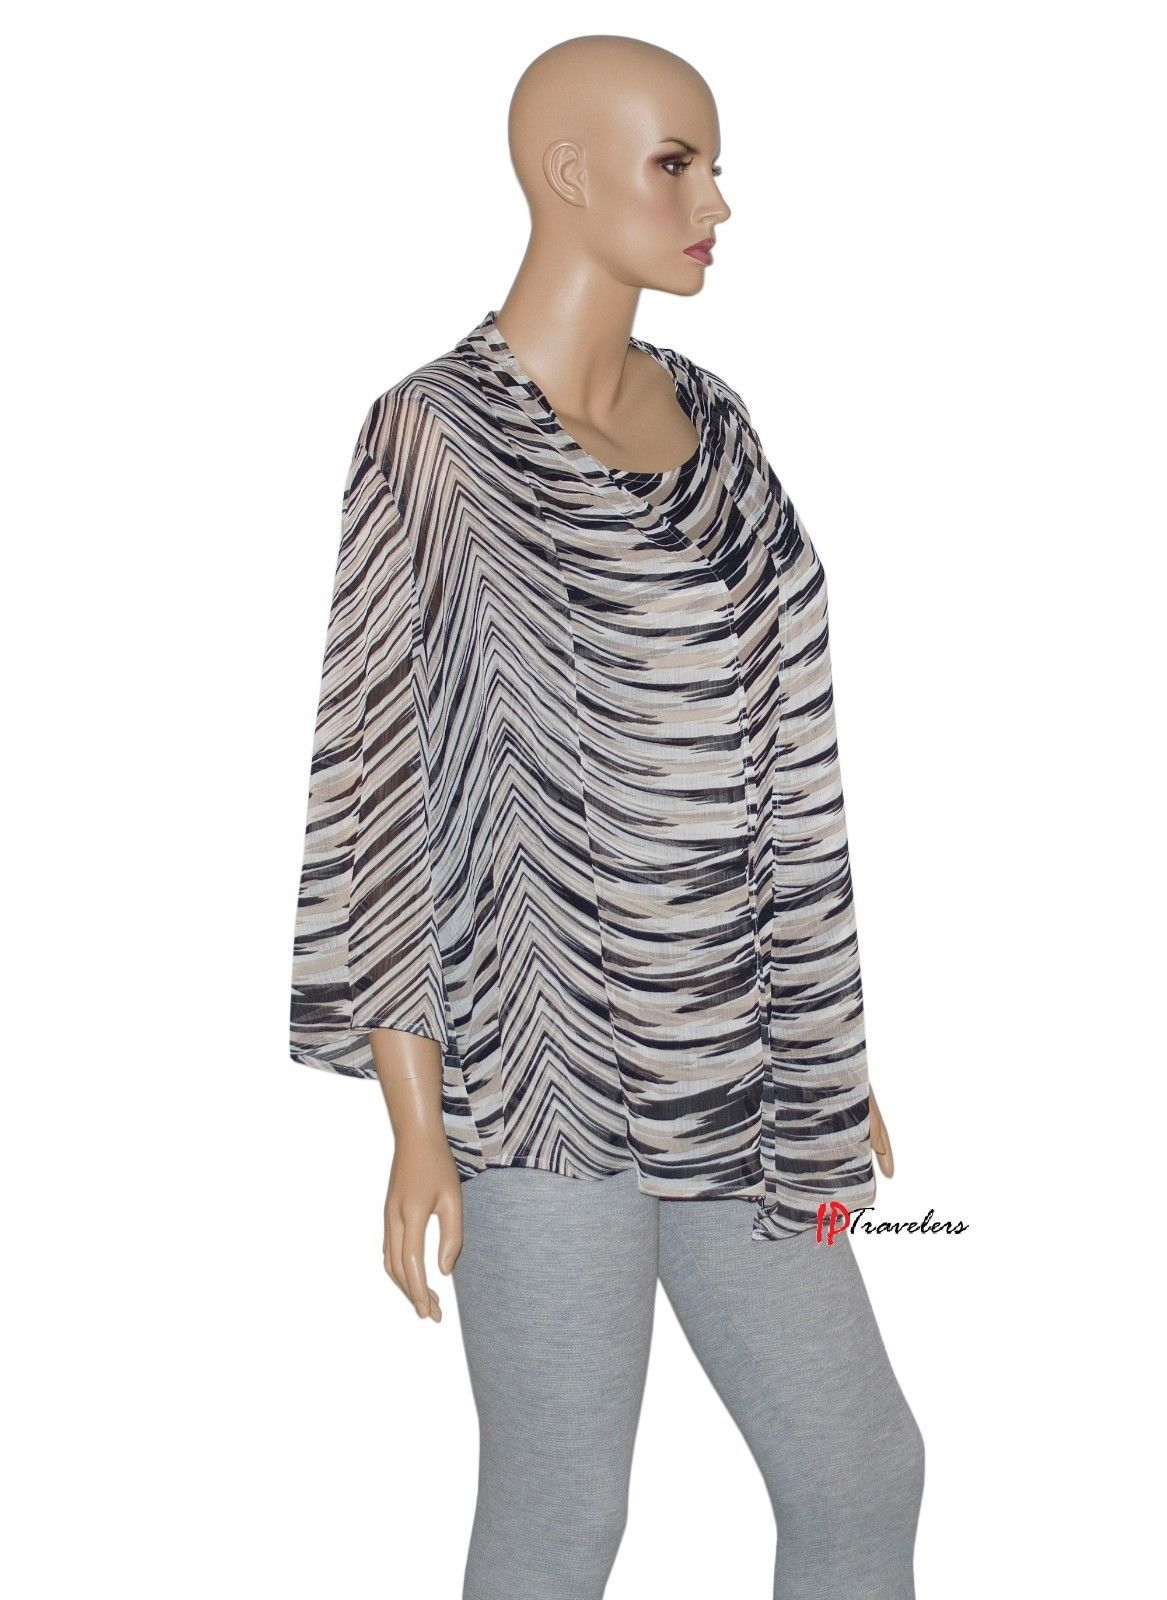 JM Collection Women's Top Blouse 2-Piece Brown Black White Polyester $59.50